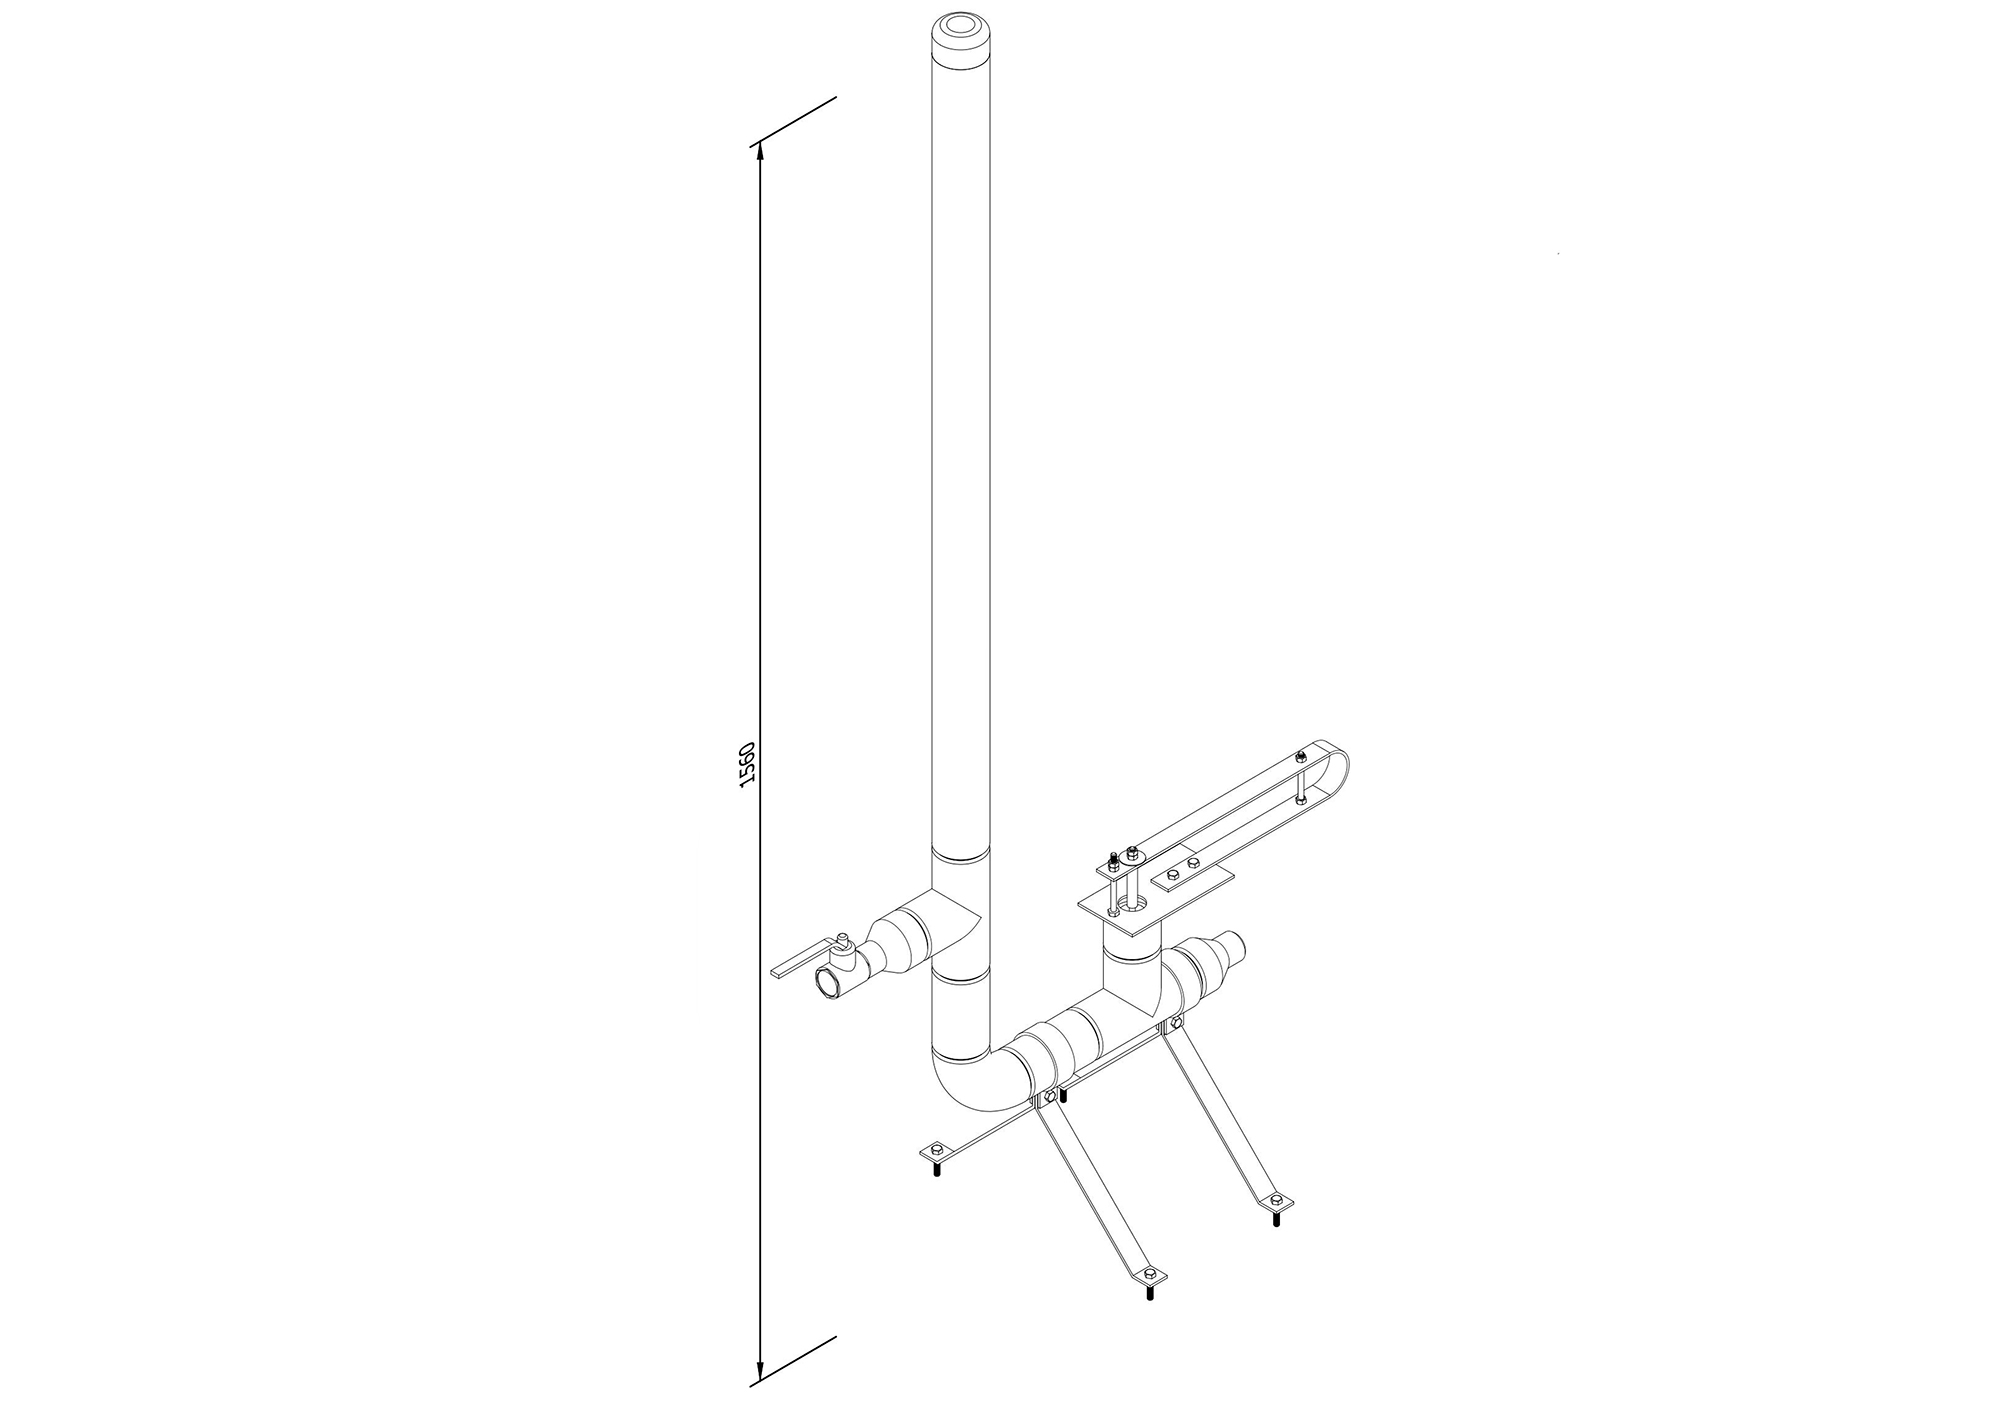 Pac hrw hydraulic-ram-for-pumping-water 0000.jpg